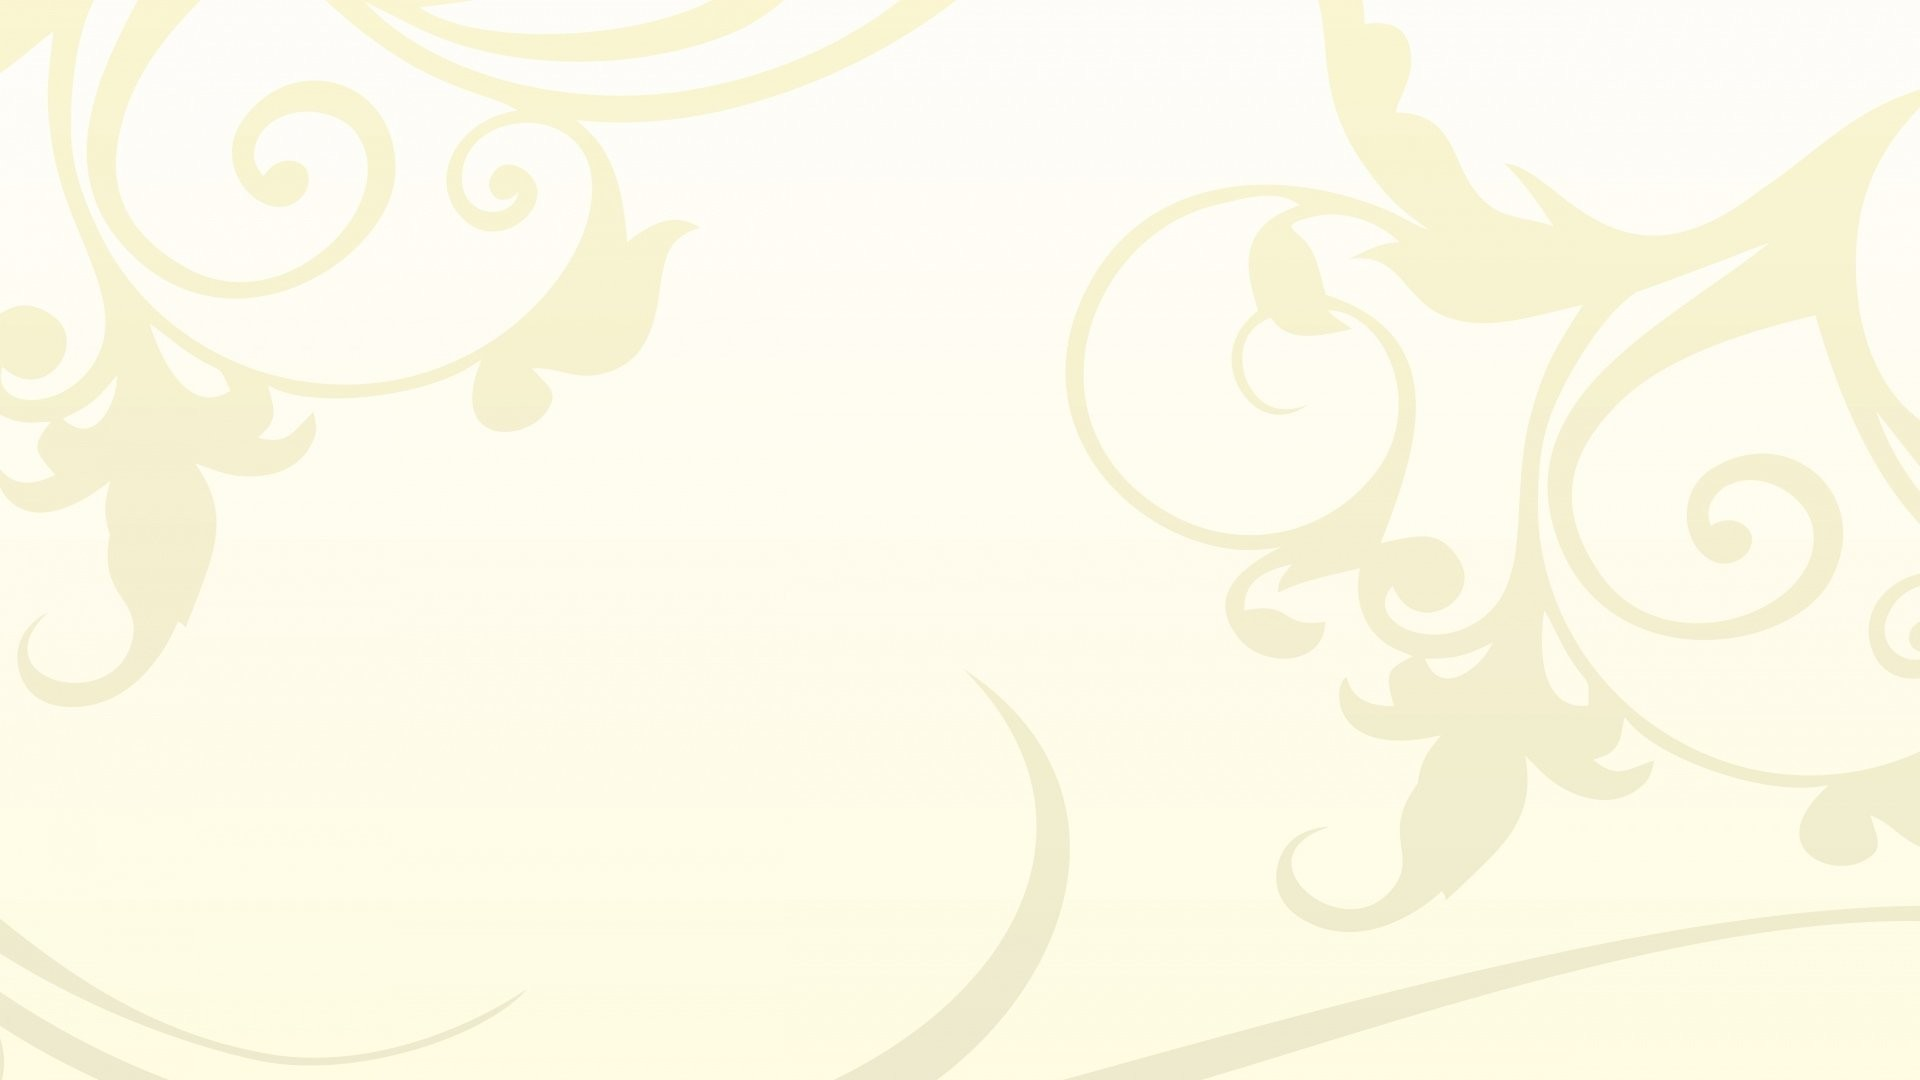 Pattern Texture Light Background Flower Image …